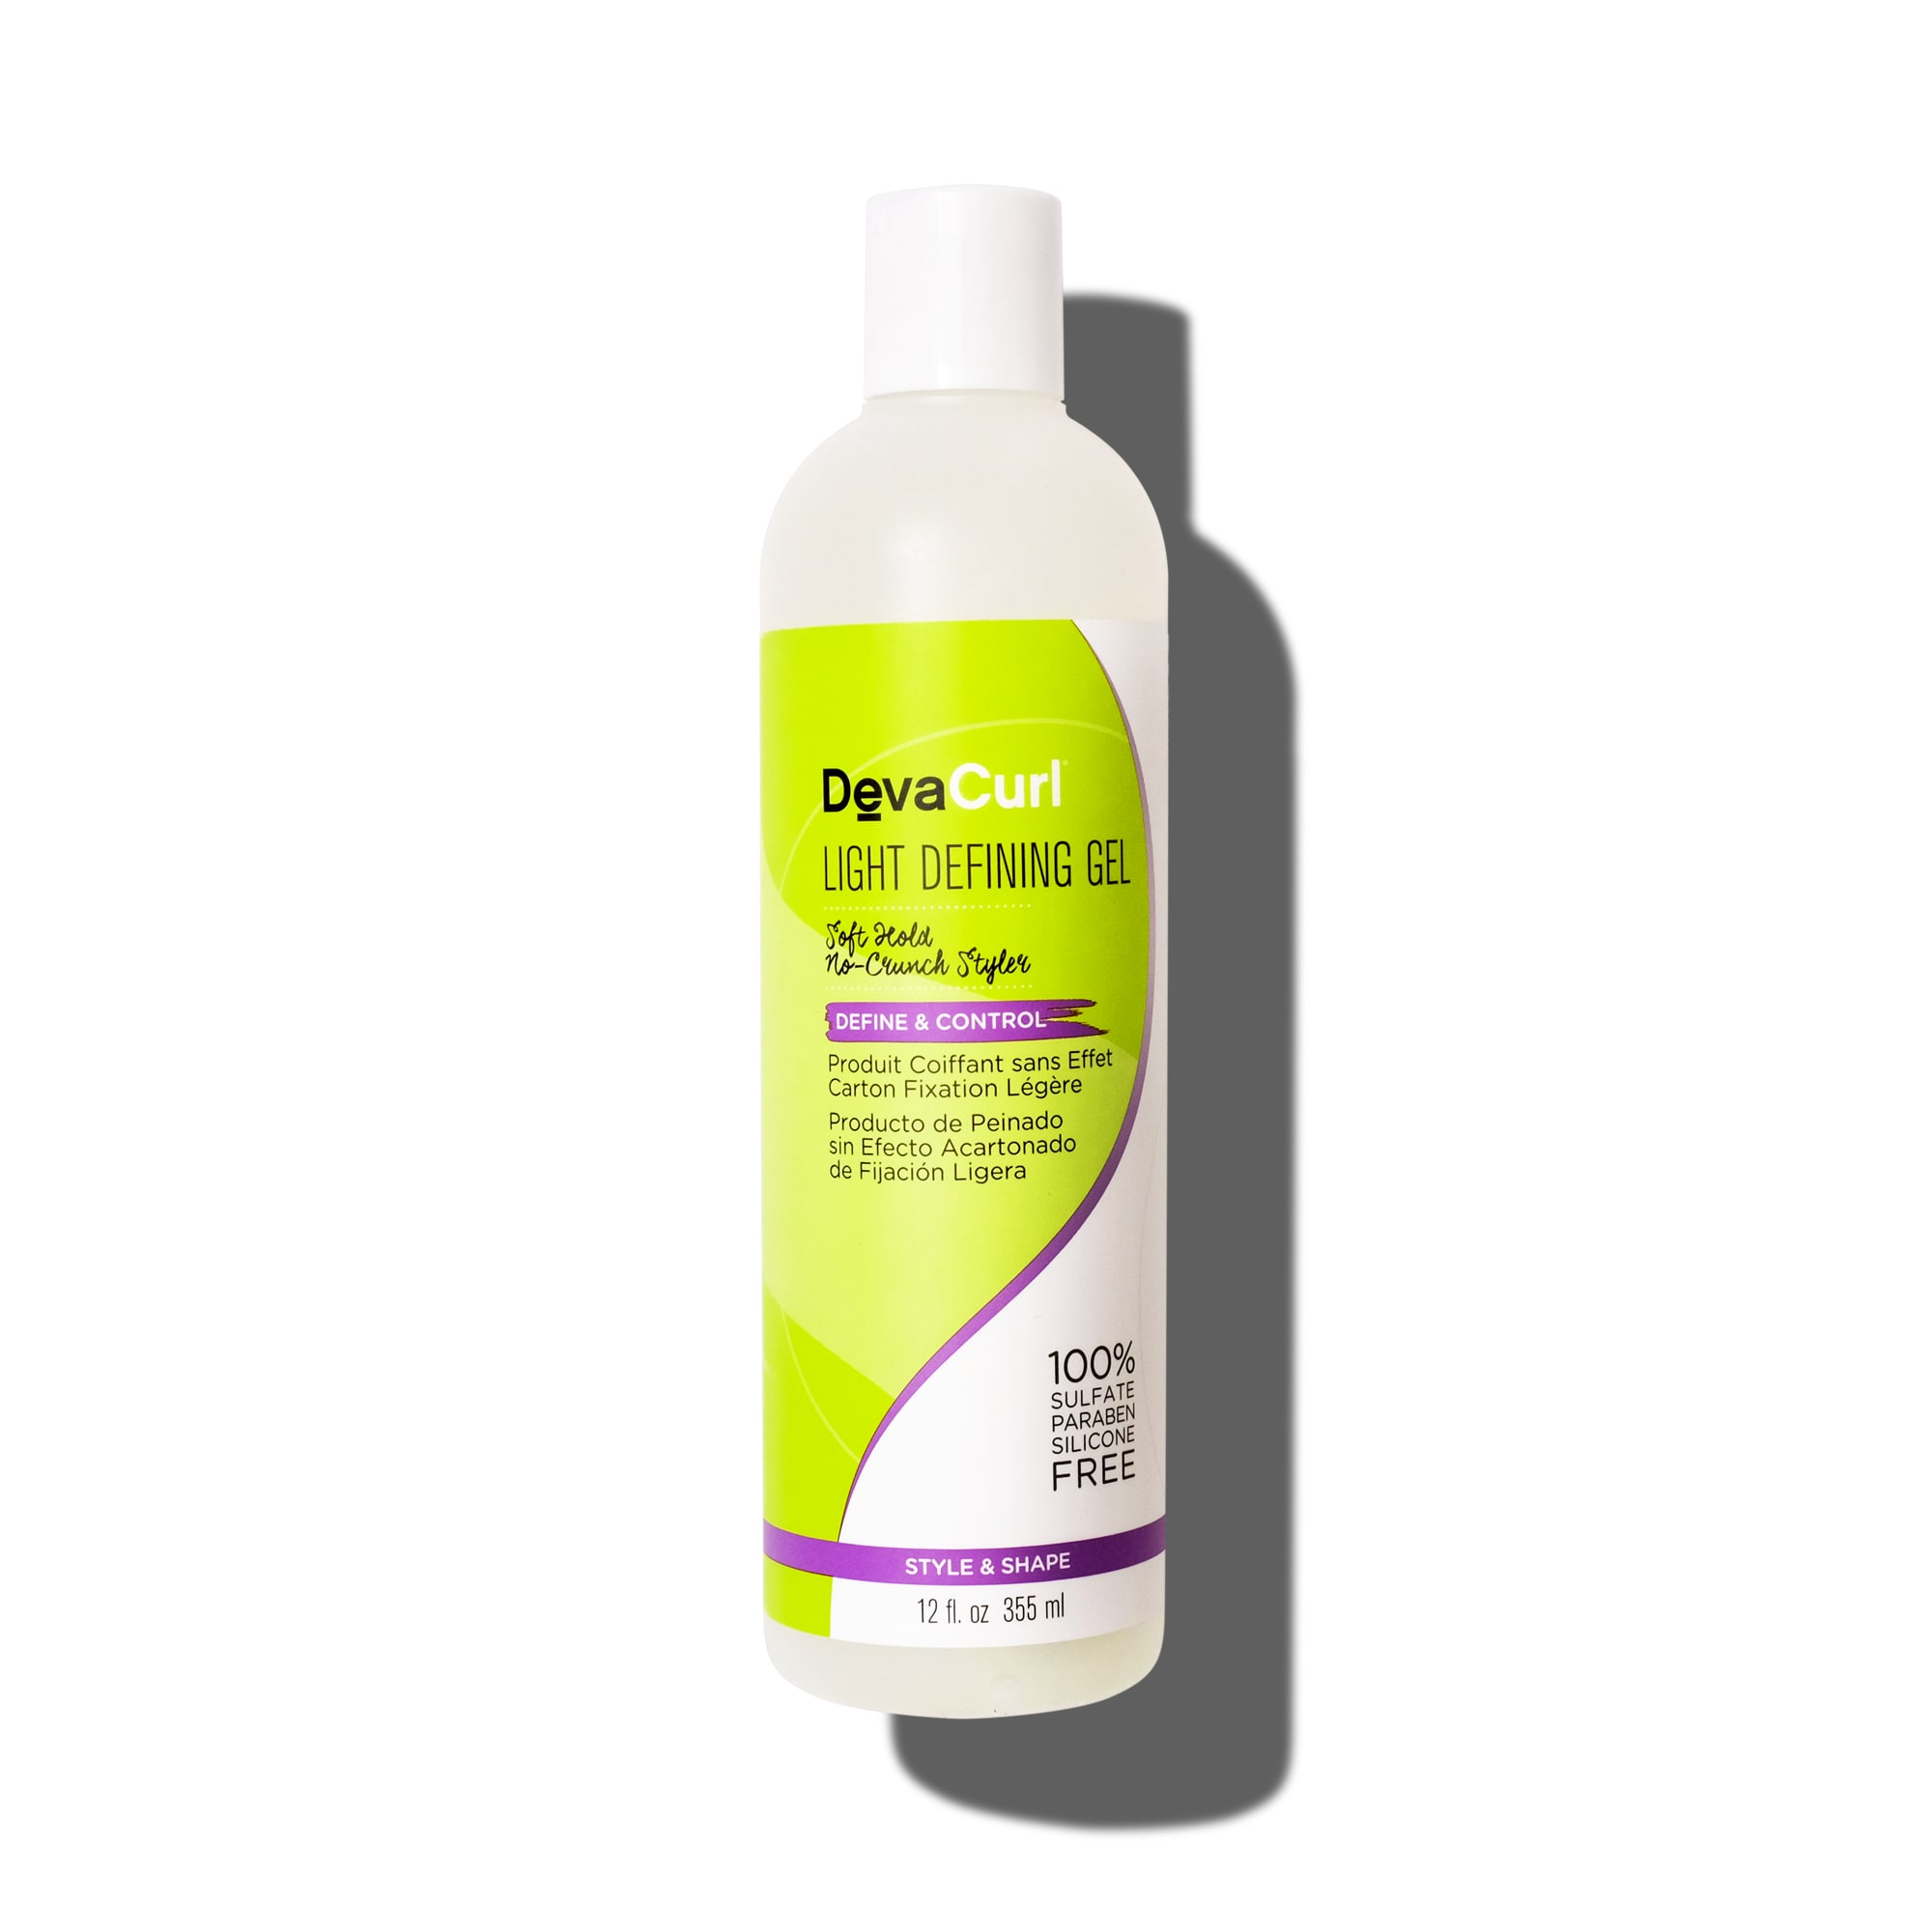 light defining gel 12oz bottle